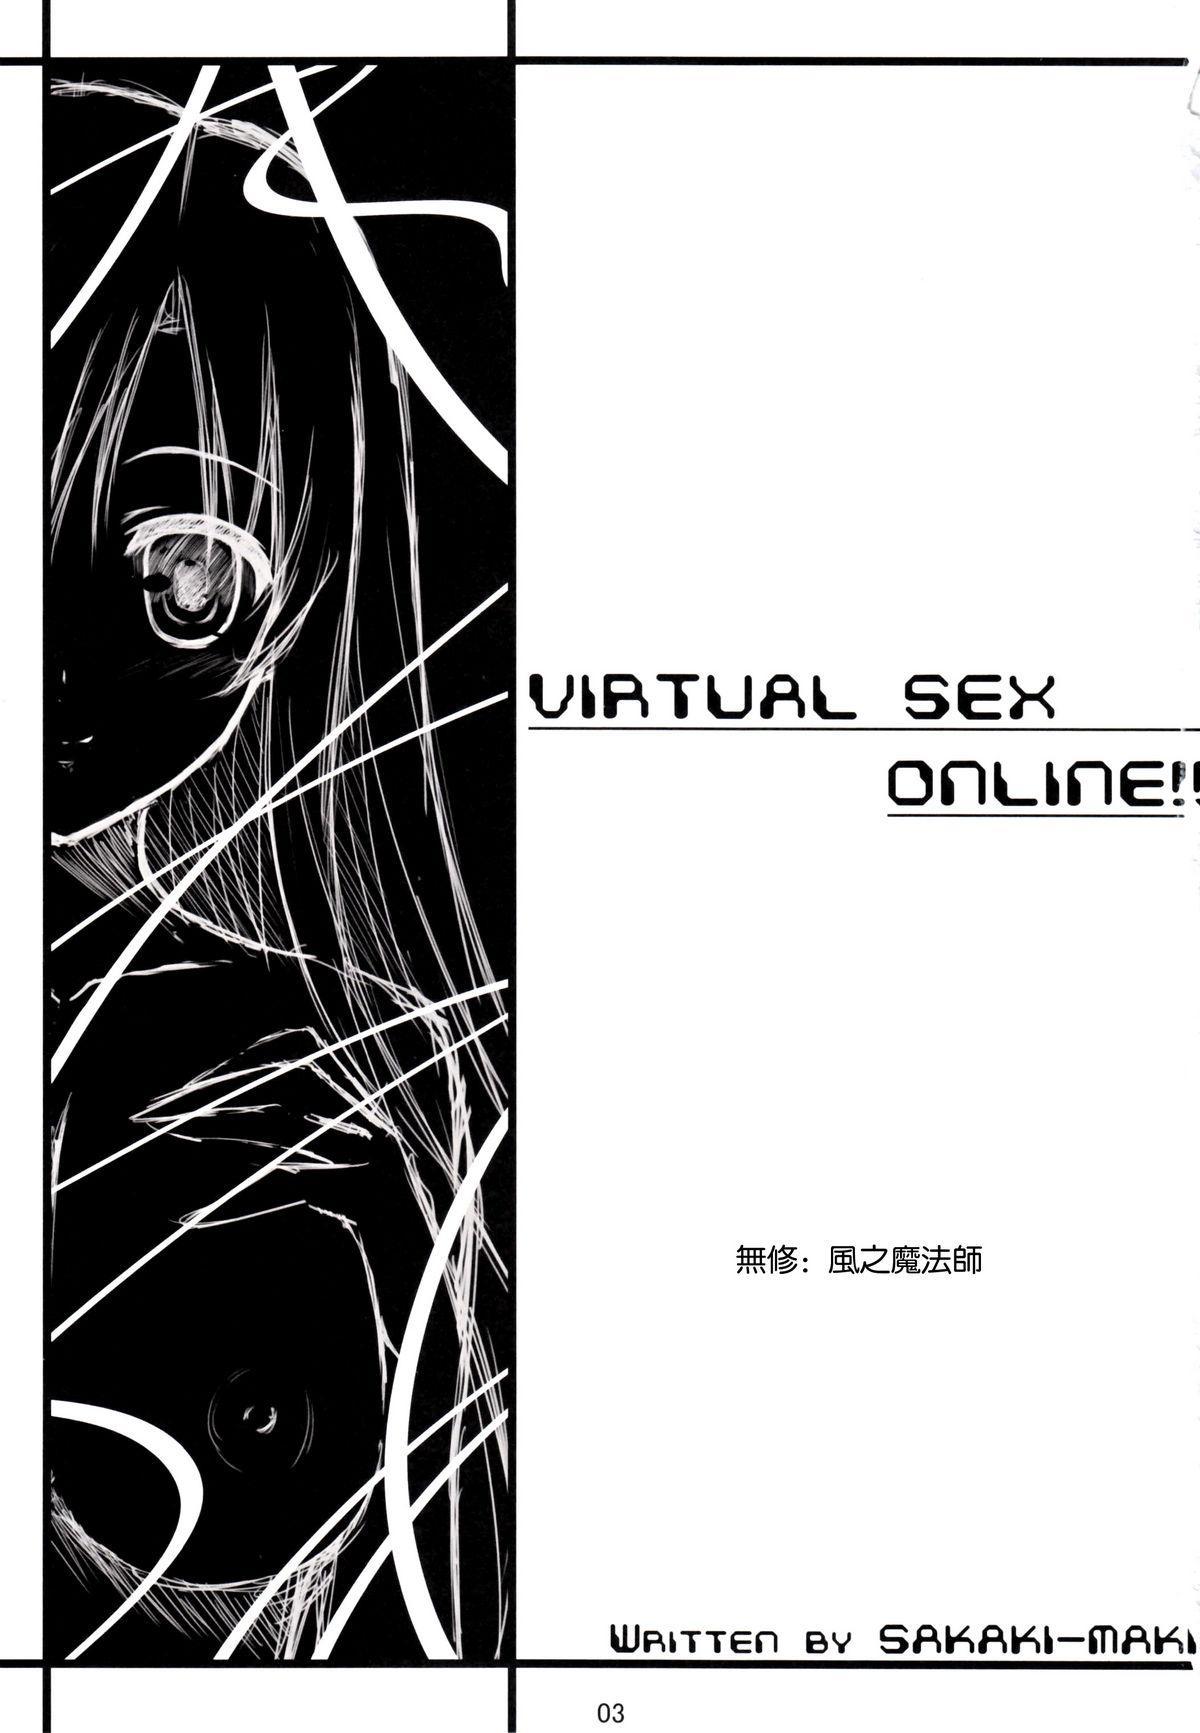 Virtual Sex Online!! 1